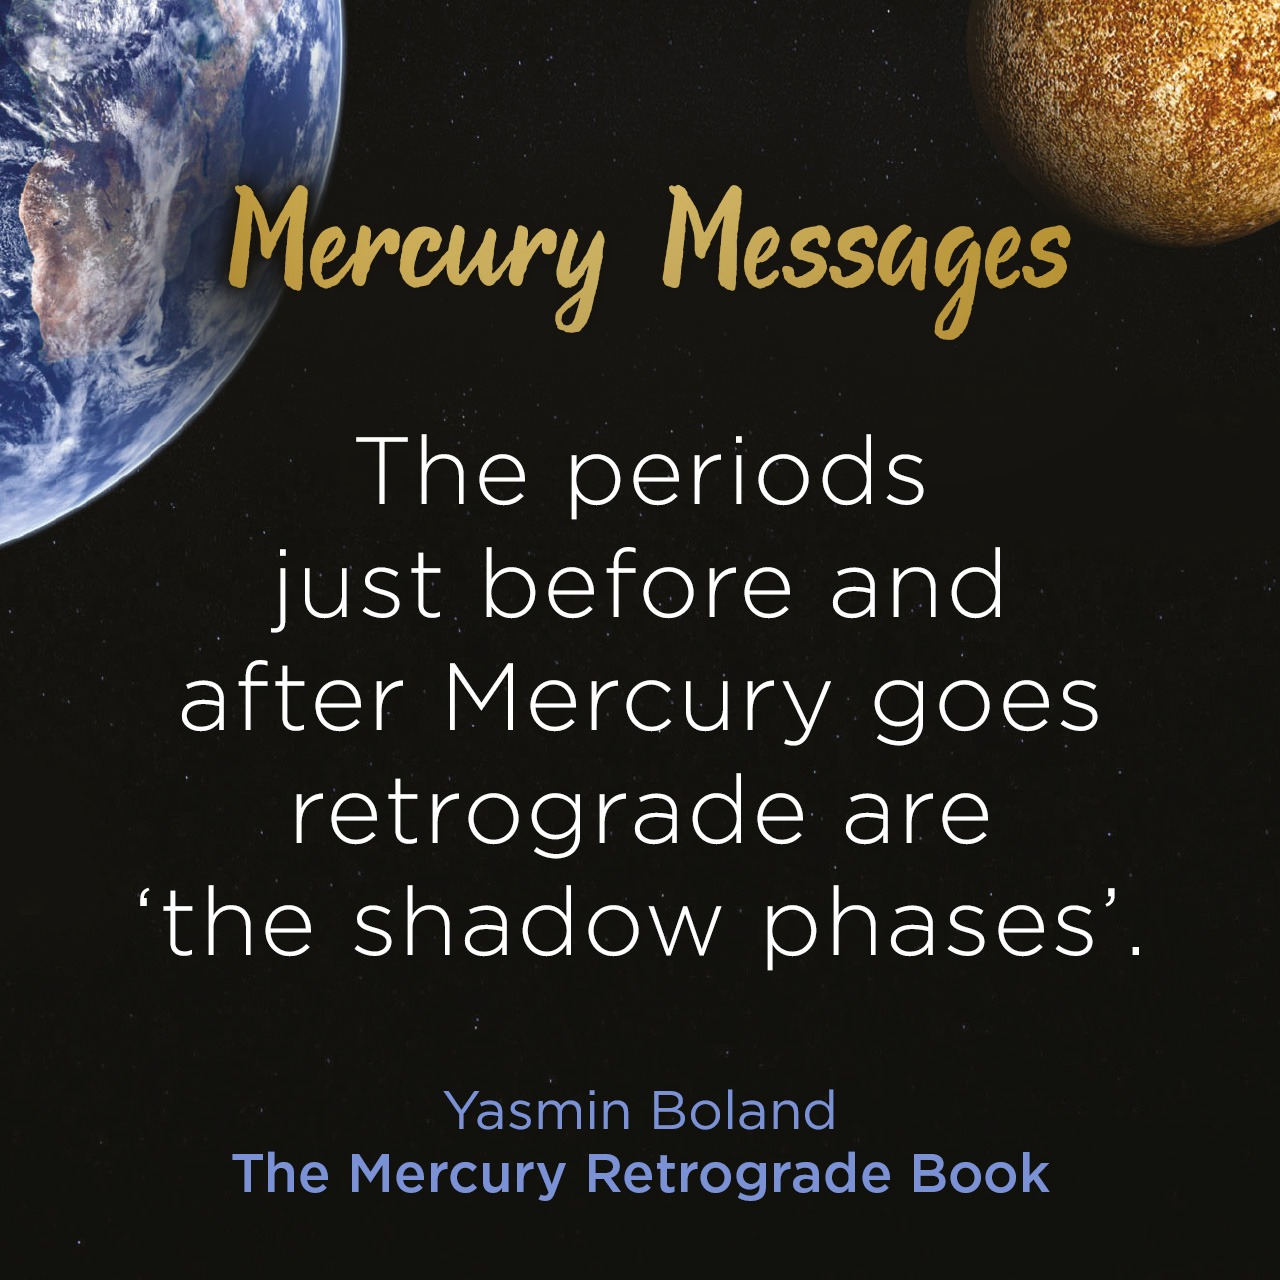 Mercury retrograde ends in 24 hours…